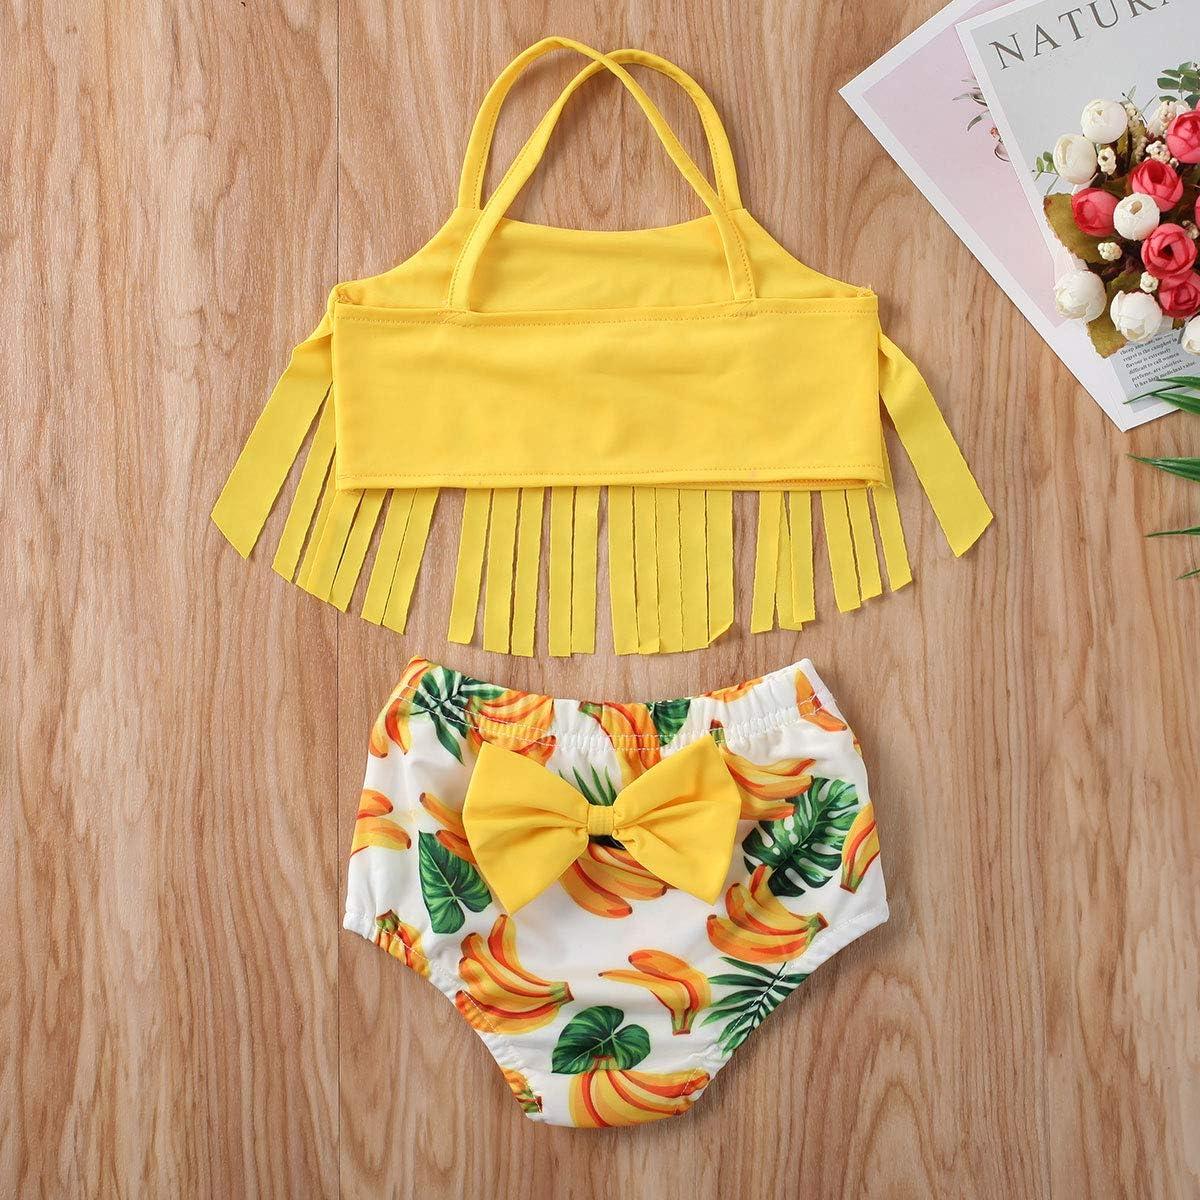 xkwyshop Toddler Newborn Infant Baby Girl Swimsuit Bikini Toddler Girls Swimwear Bathing Suit 2 Piece Beachwear 6M-5T